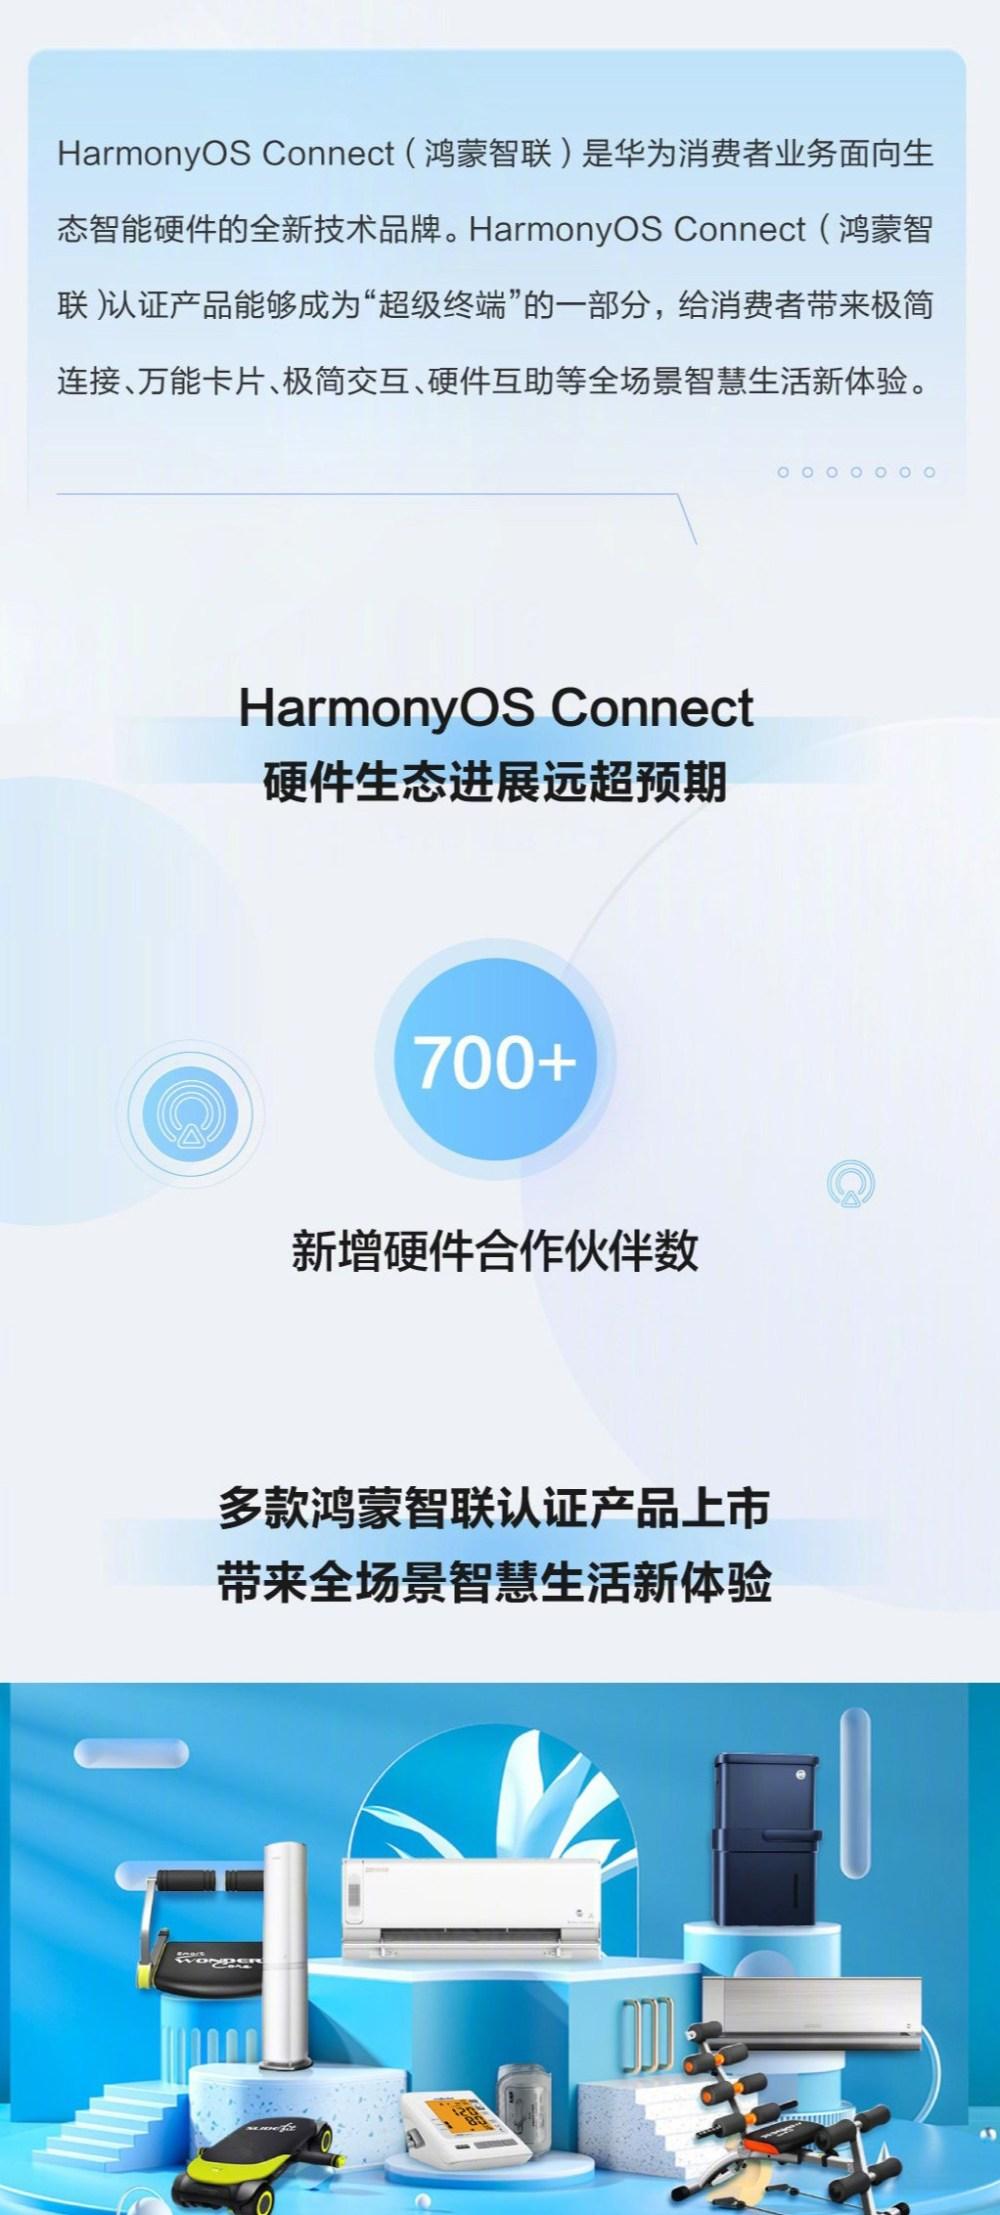 HarmonyOS connect 700 partners